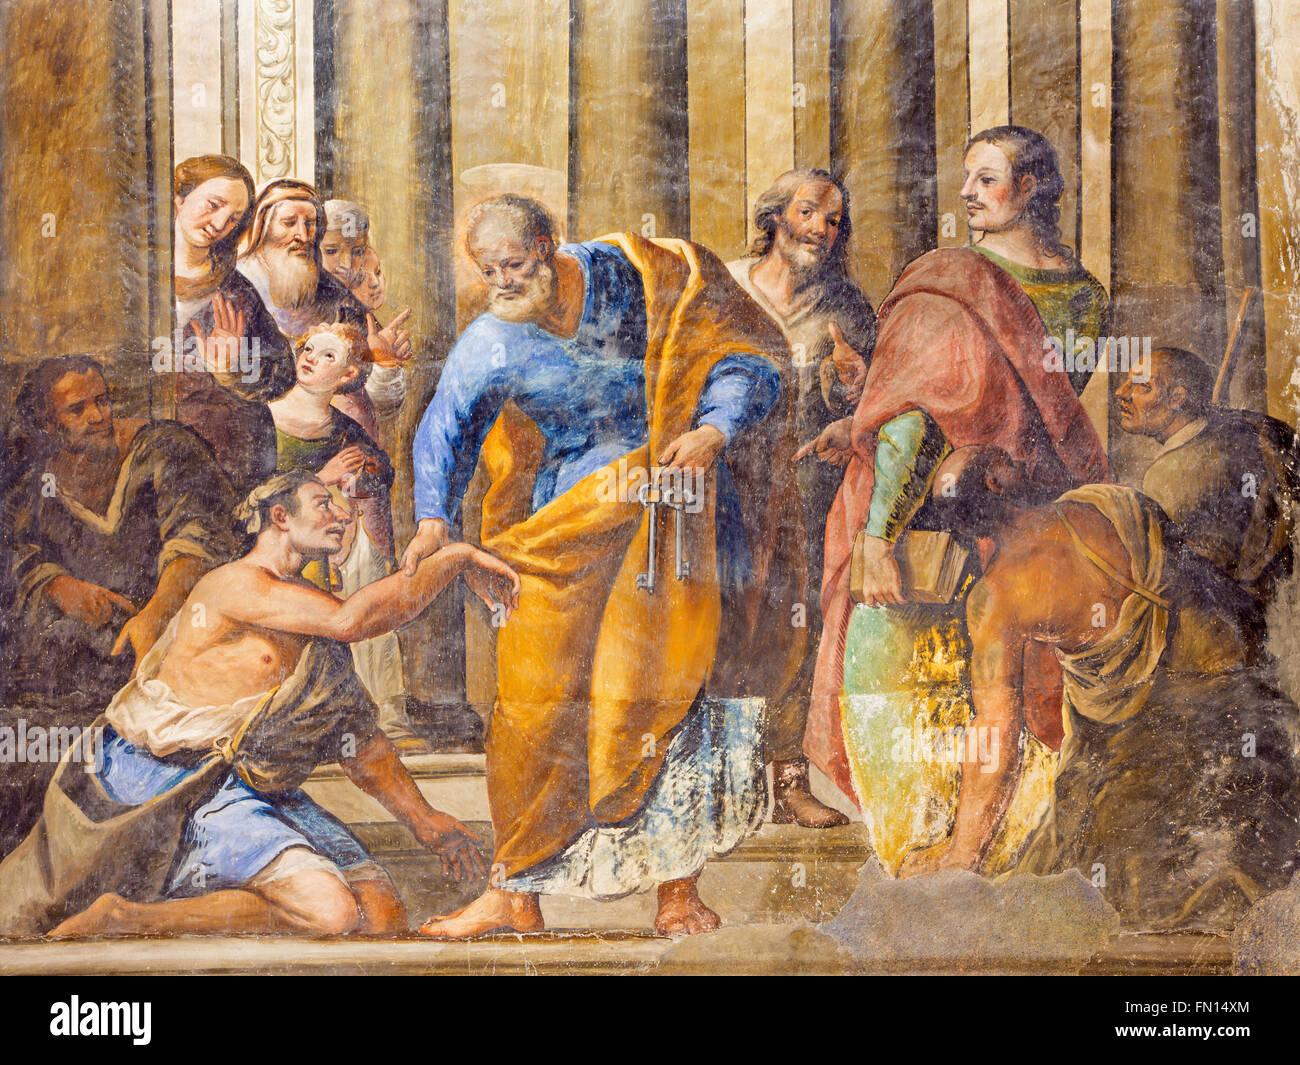 GRANADA, SPAIN - MAY 29, 2015: The fresco of scene as St Peter Healing the Cripple in the church Monasterio de San - Stock Image